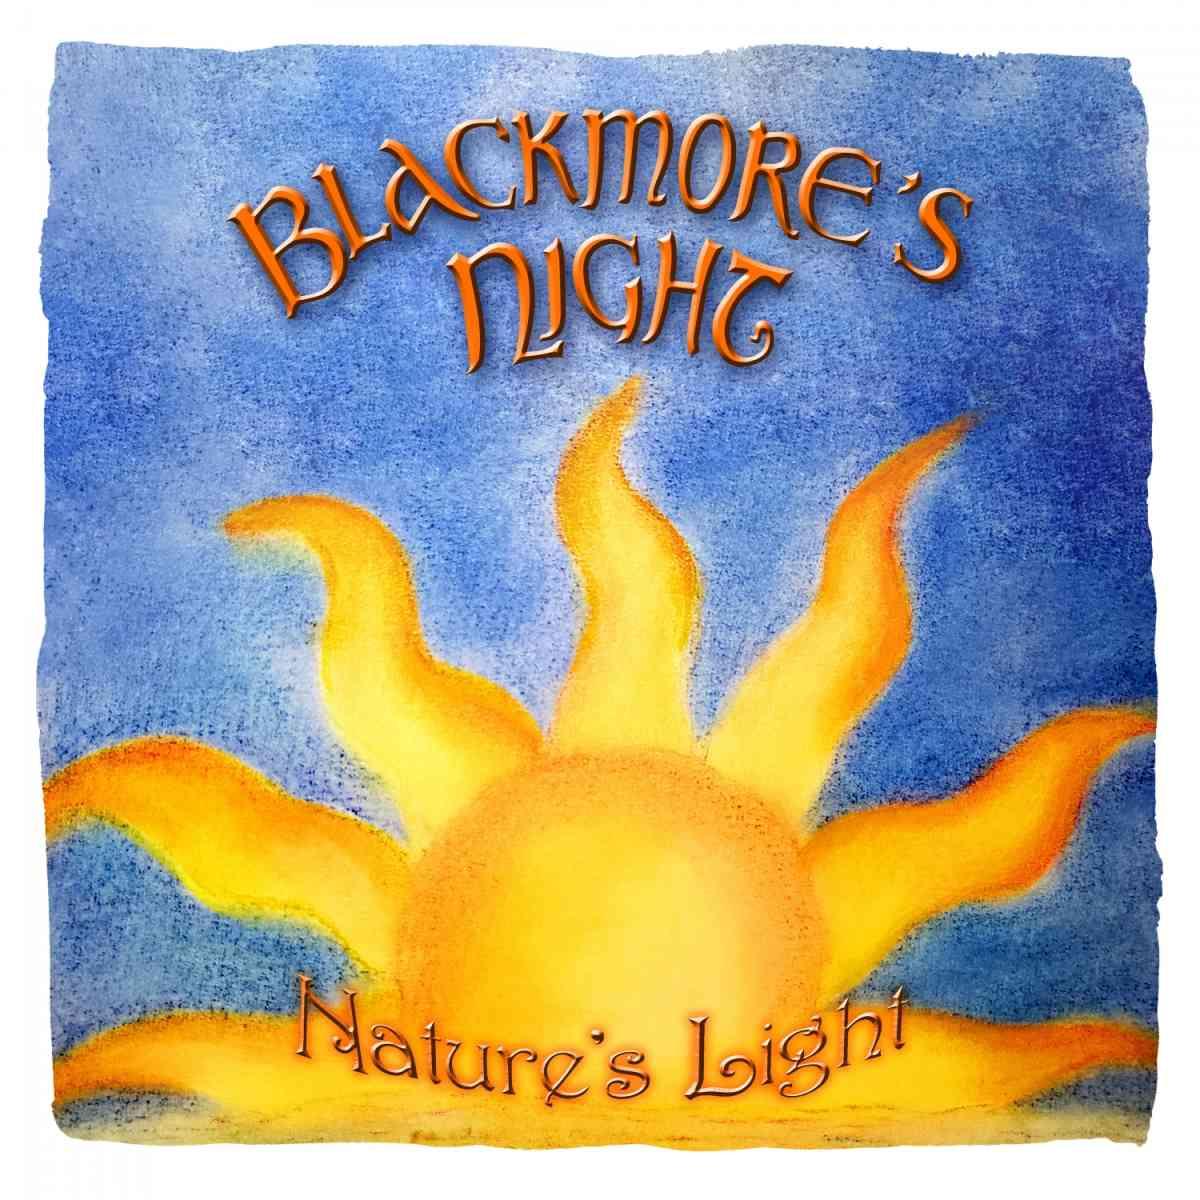 Blackmores Night - Natures Light - album cover